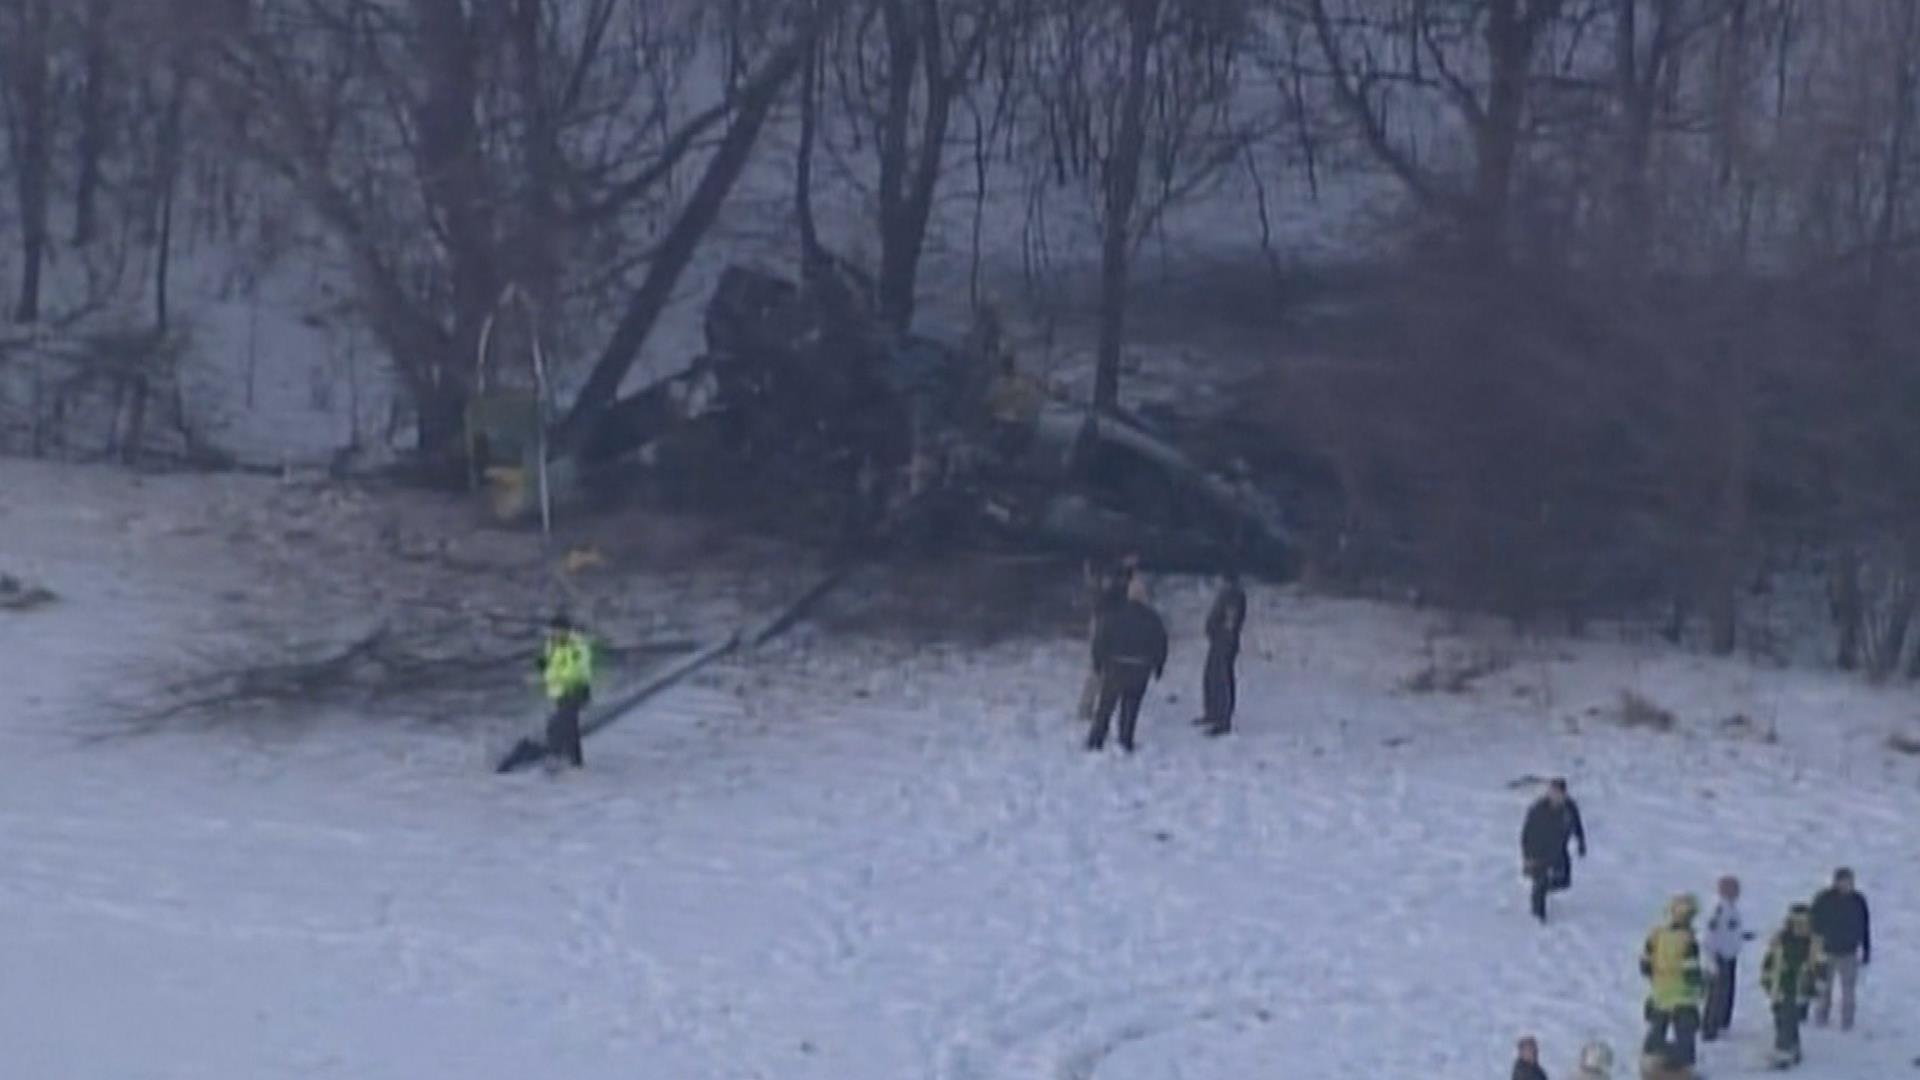 3 National Guard members dead in Black Hawk helicopter crash in Minnesota